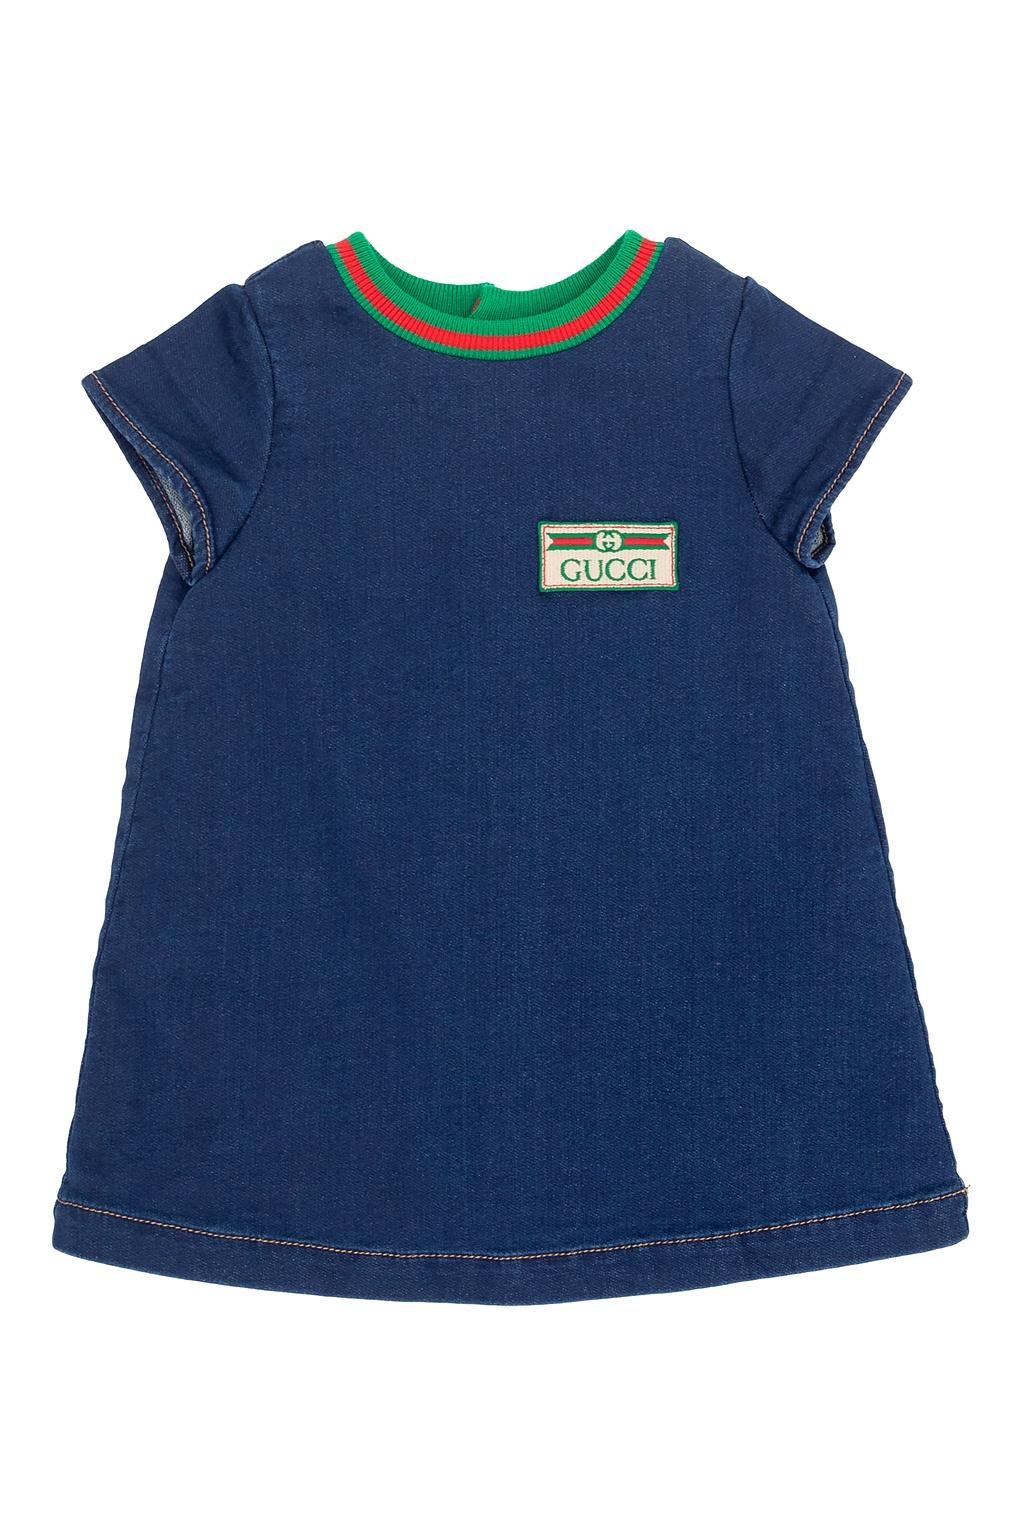 Gucci Kids Logo dress